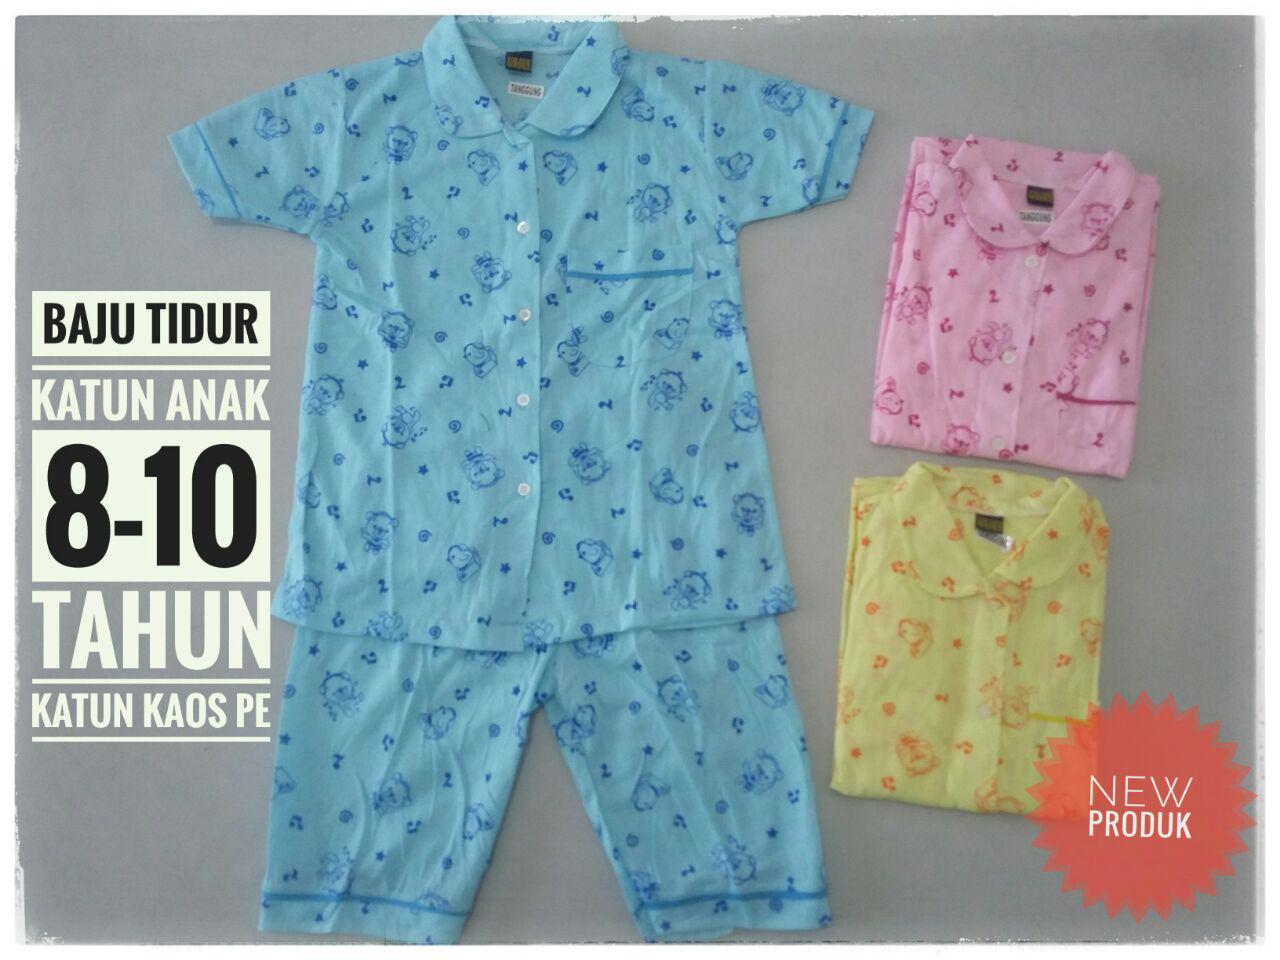 ObralanBaju.com Obral Baju Pakaian Murah Meriah 5000 Baju Tidur Katun TG